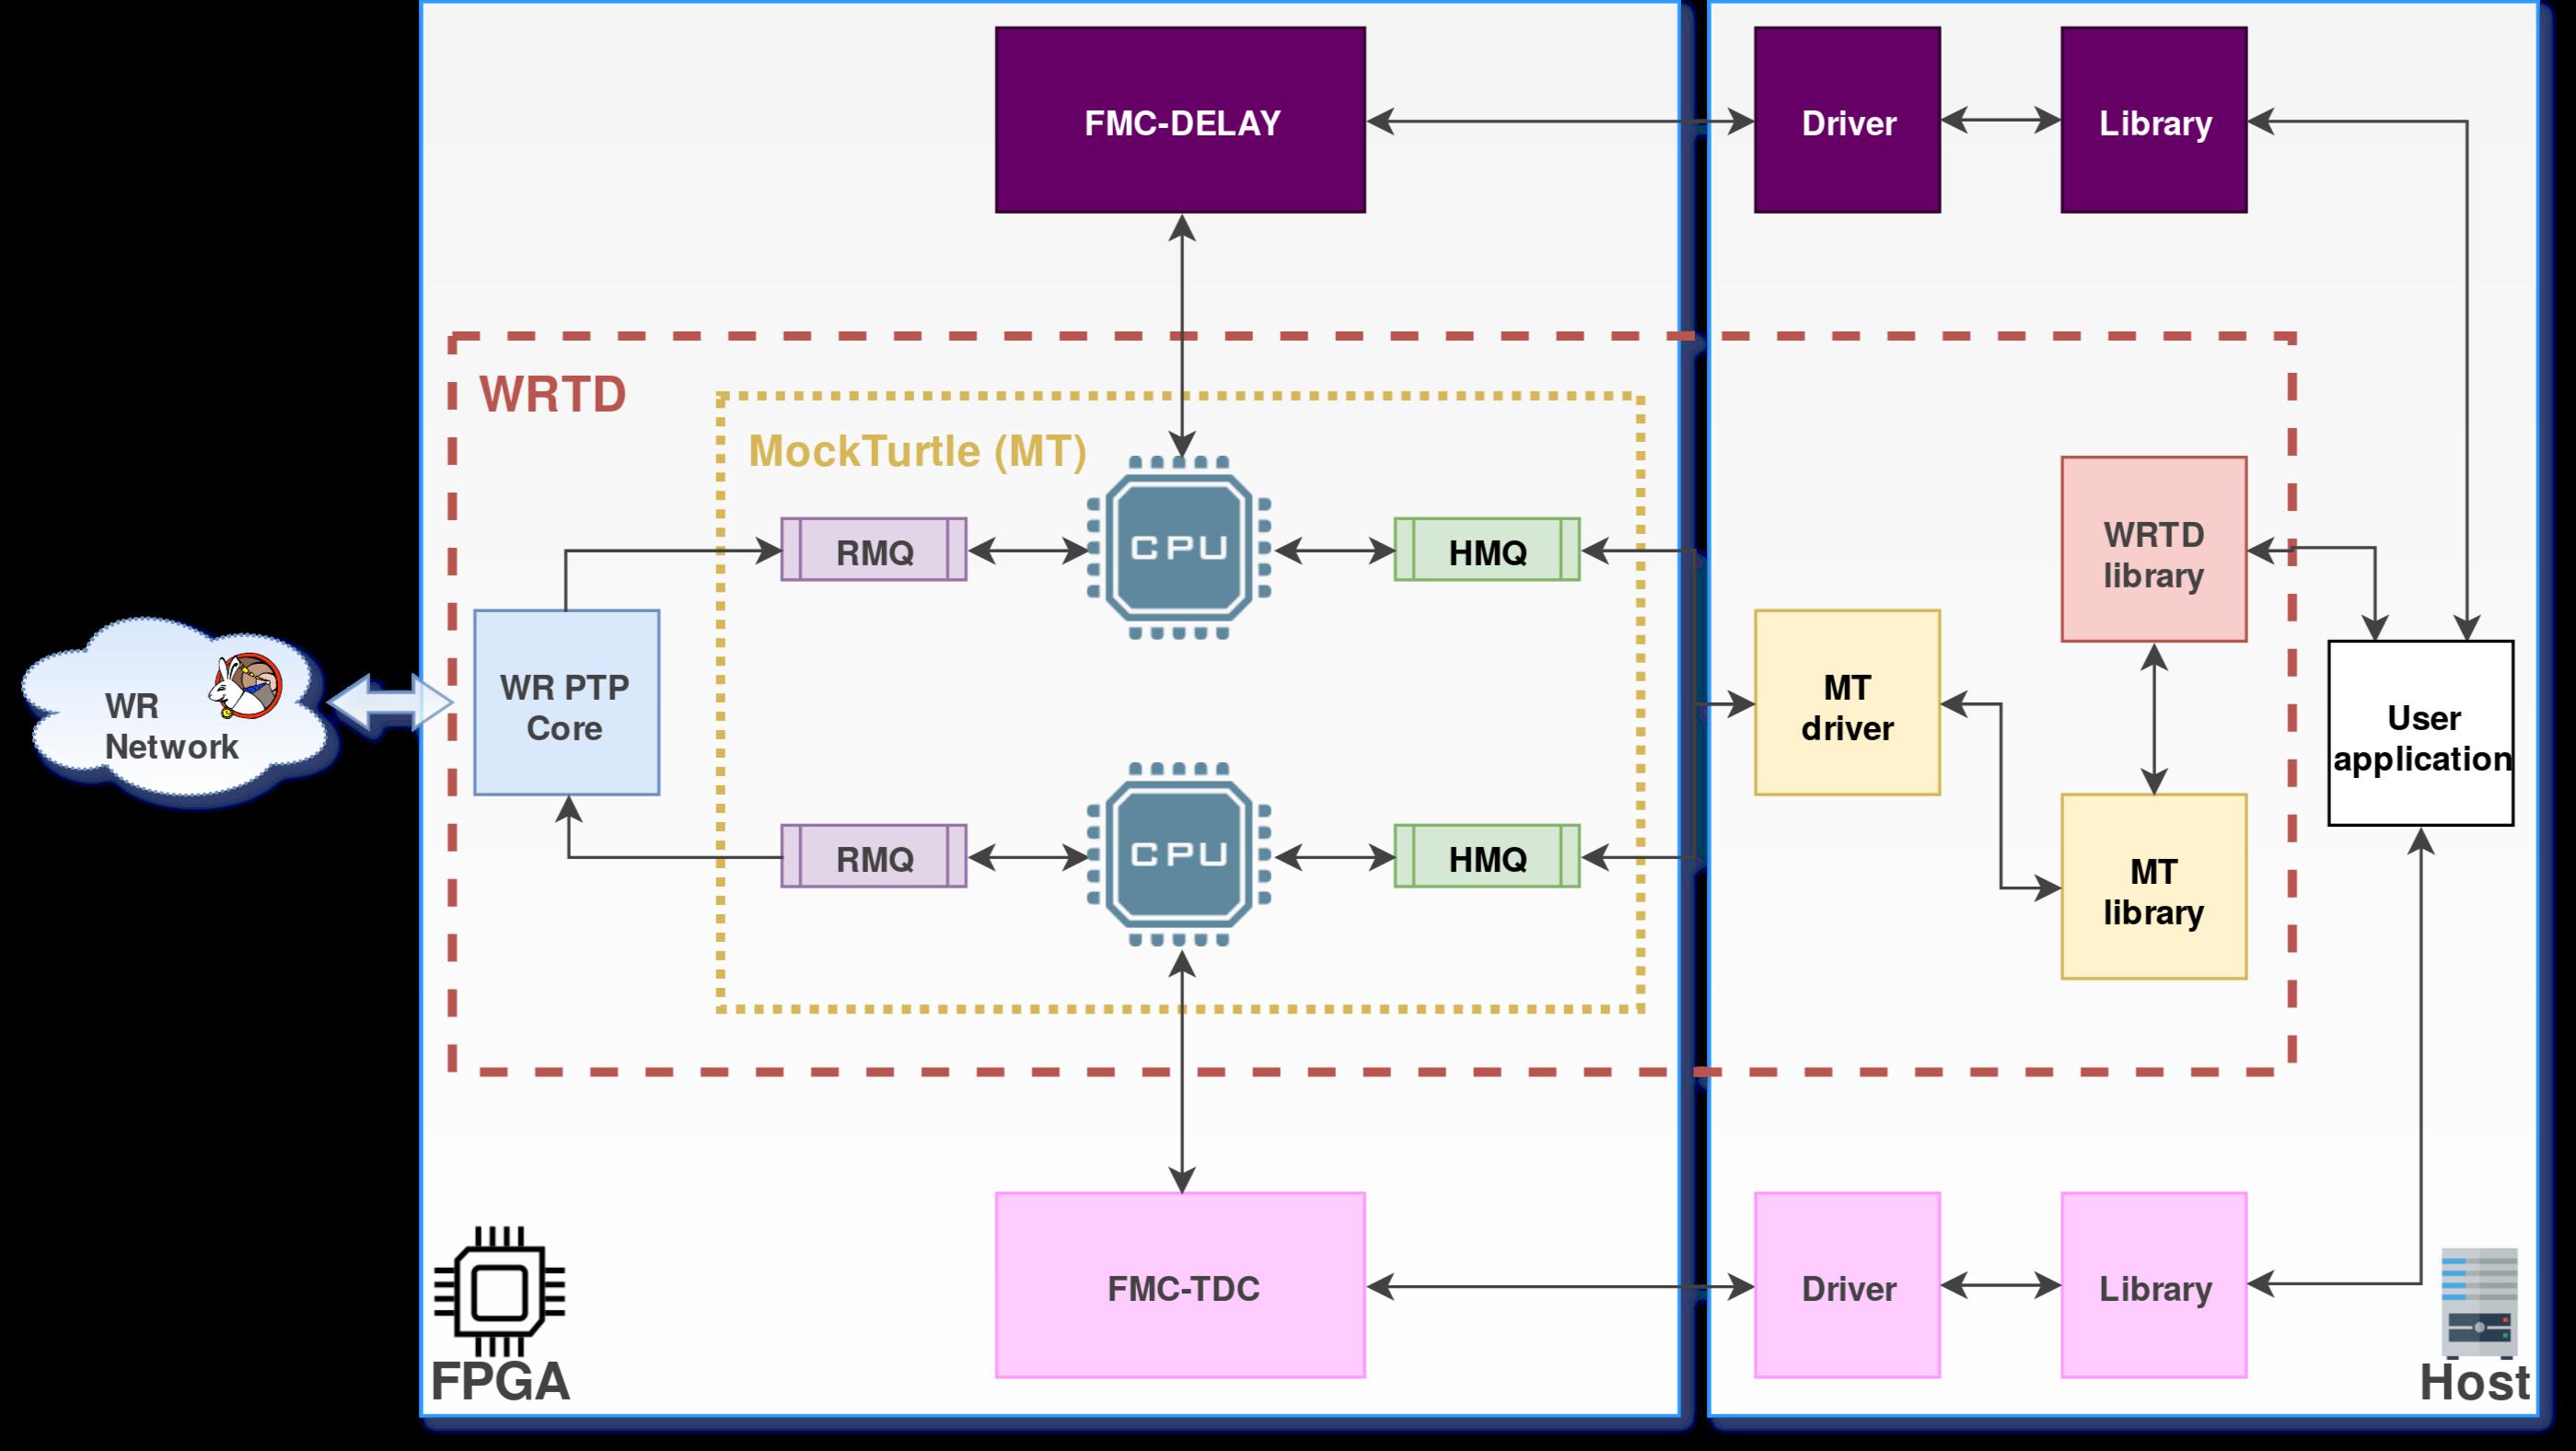 doc/graphics/wrtd_ref_design_svec_list.png